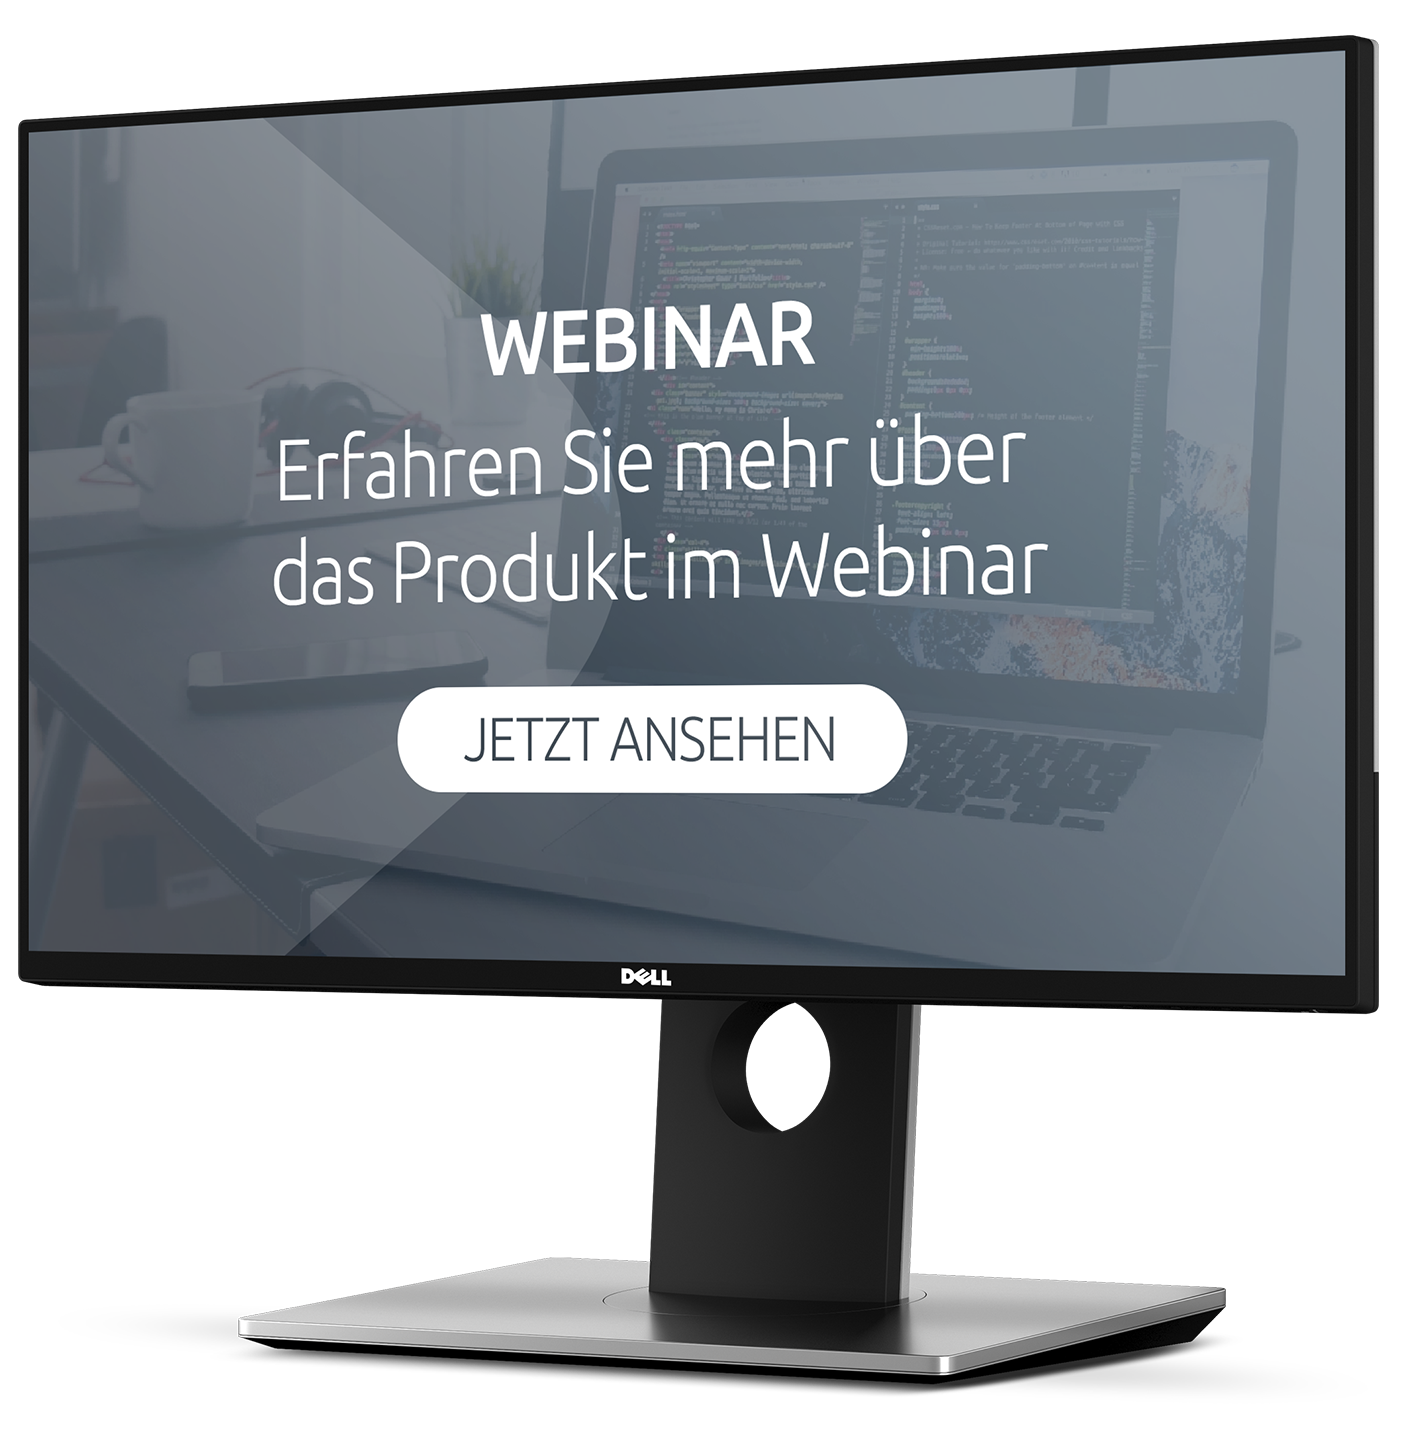 Kostenloses Webinar zu ecm:one Invoices for DATEV